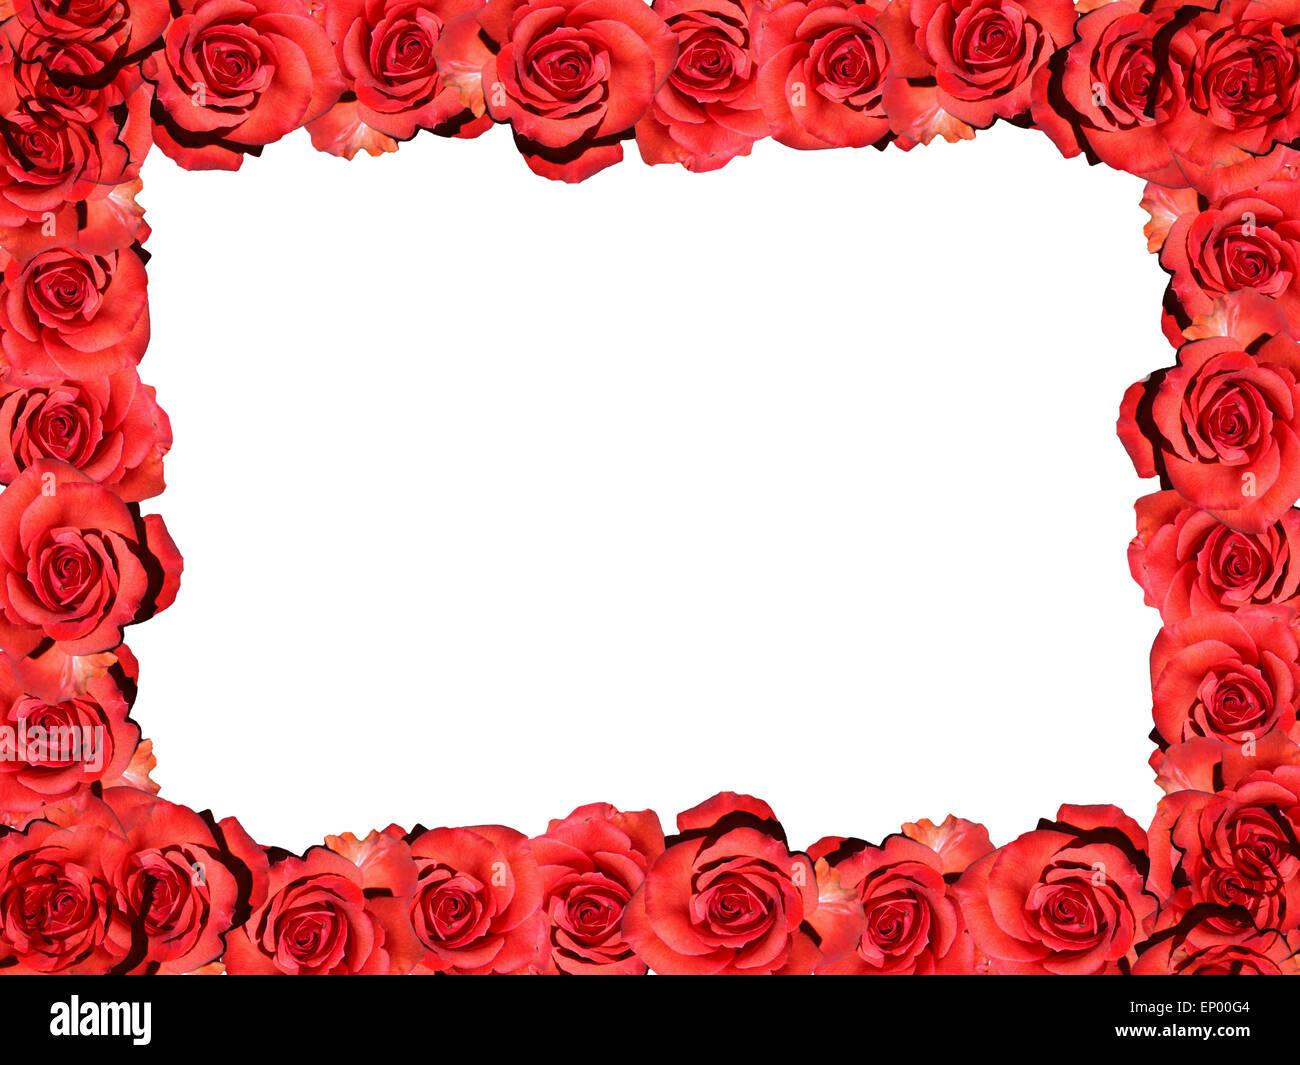 Rahmen: Rote Rosen - Symbolbild Liebe / Valentinstag / Rahmen: rote ...